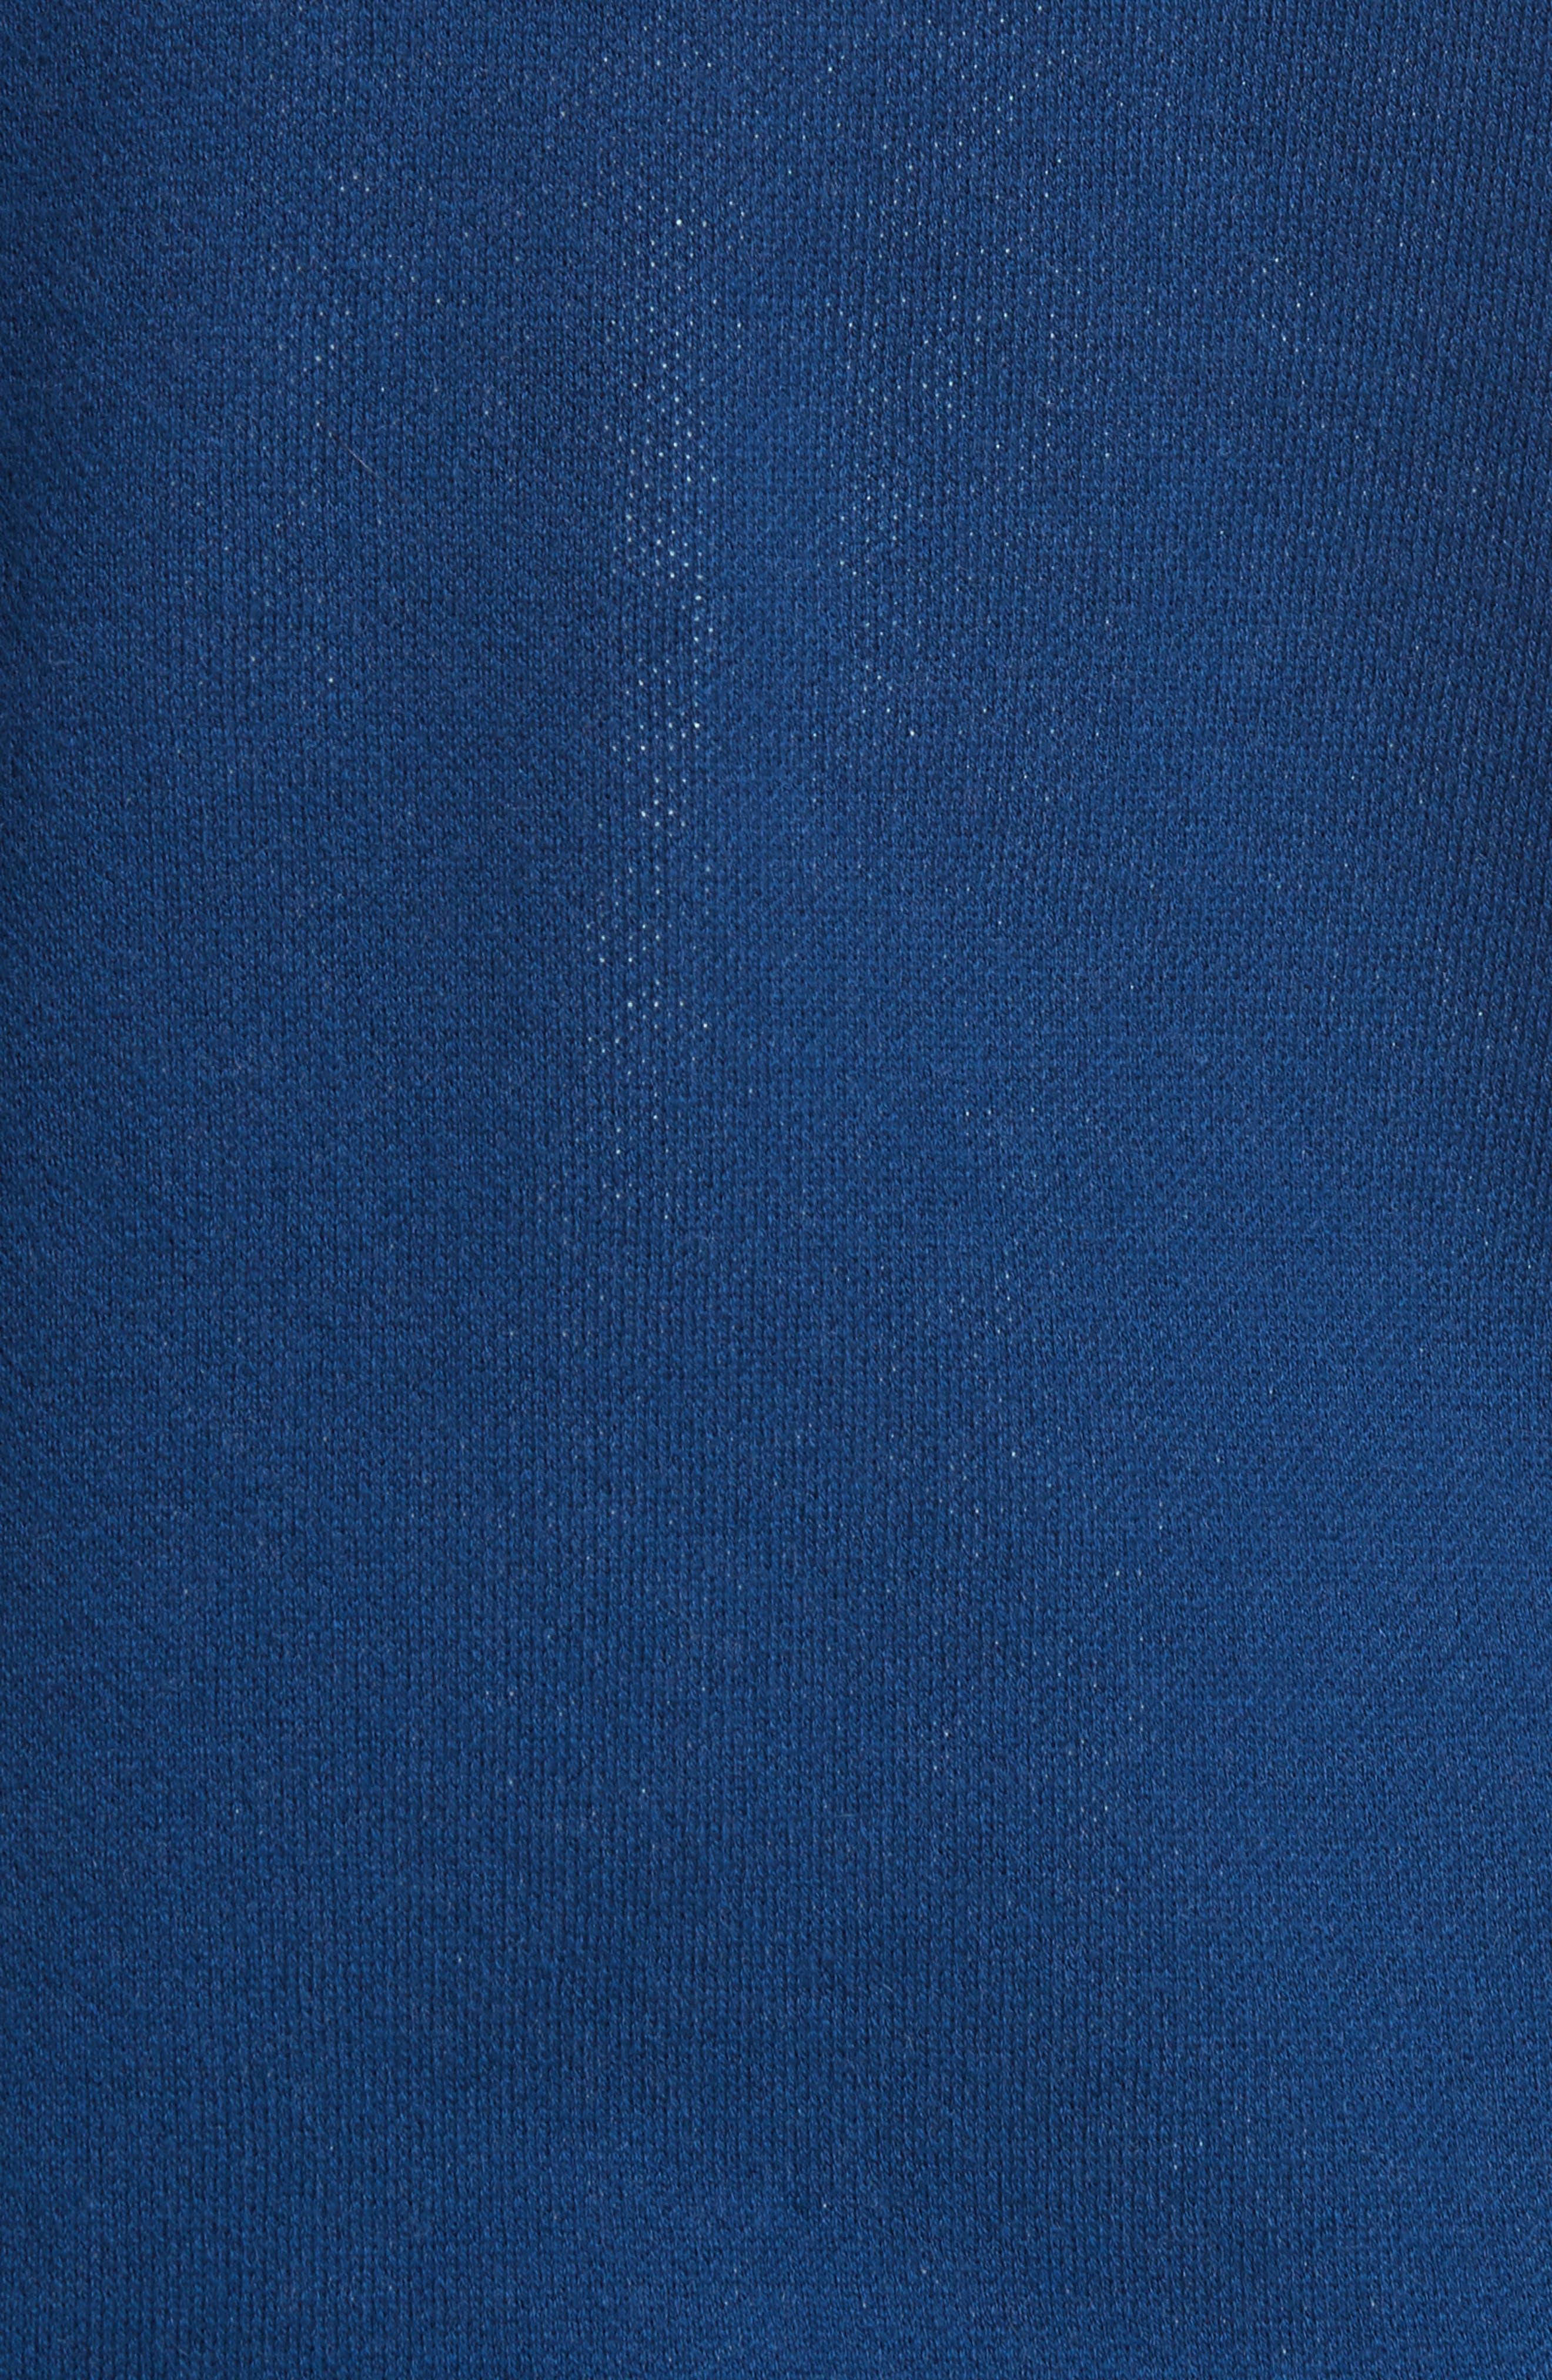 CIA Crewneck Sweater,                             Alternate thumbnail 5, color,                             401